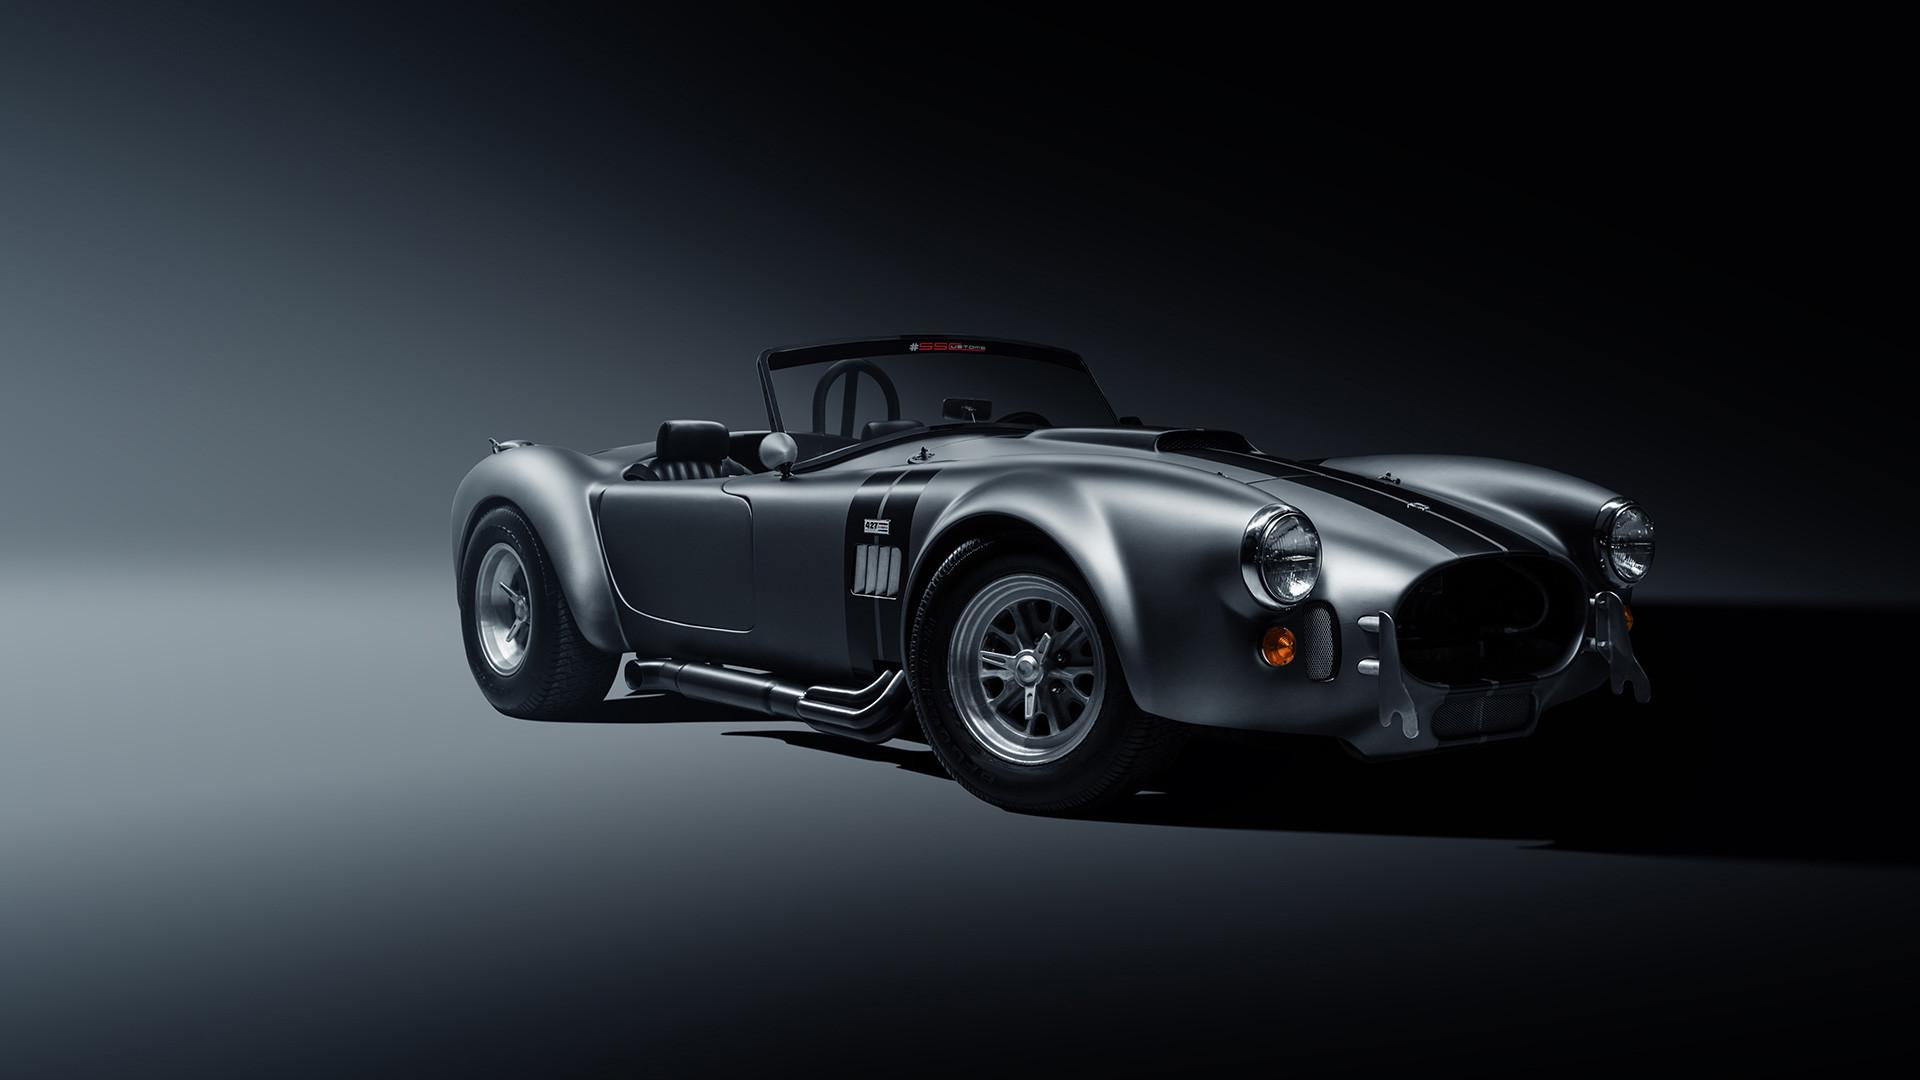 Shelby Cobra SS Customs